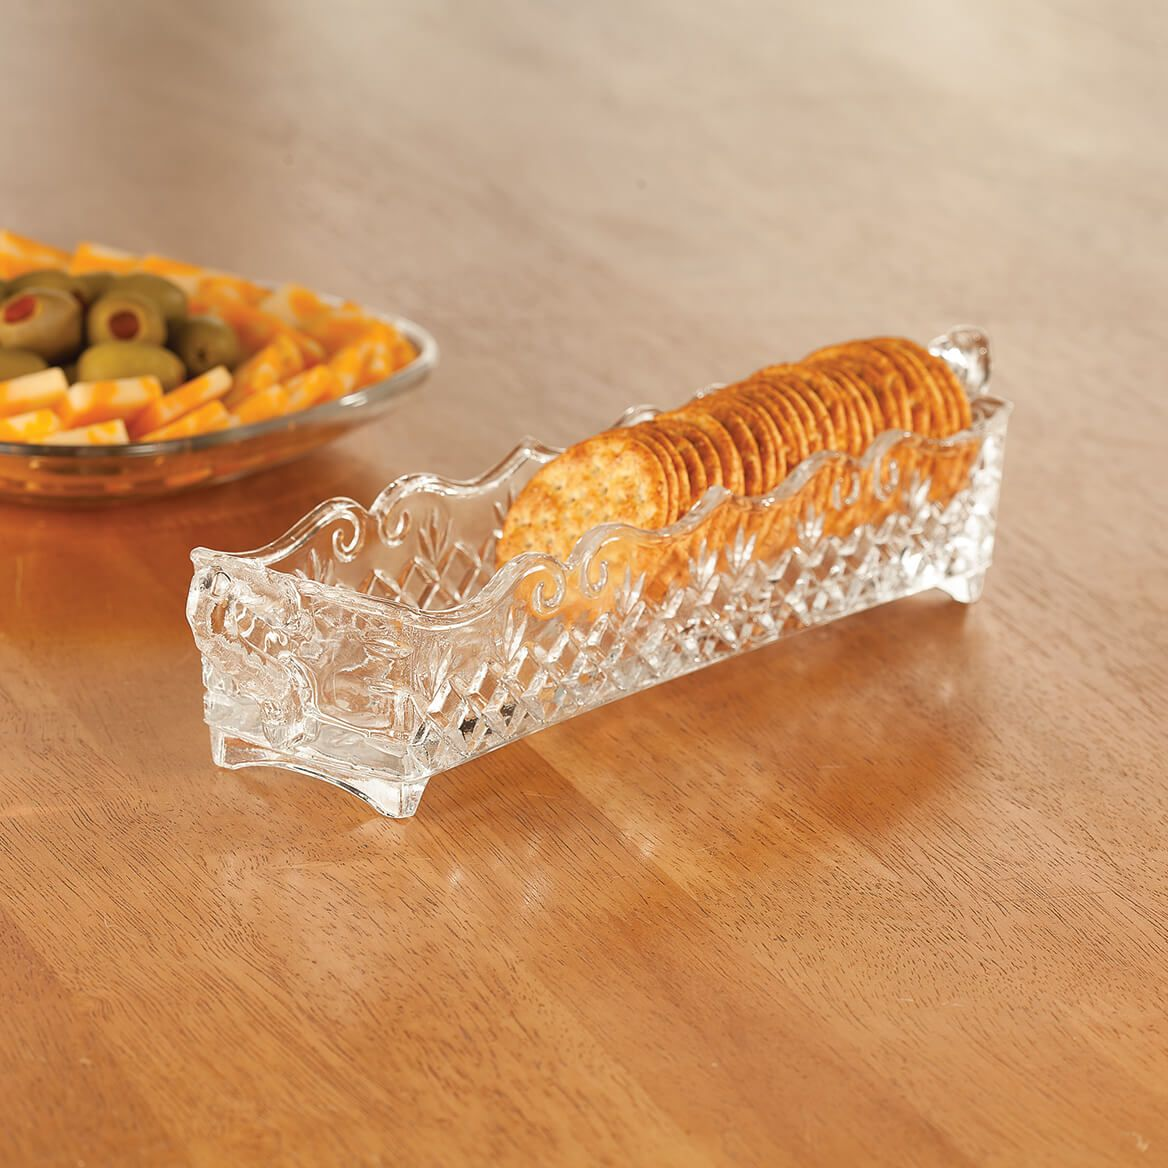 William Roberts Vintage Glass Cracker & Relish Trays, Set of 2-367561